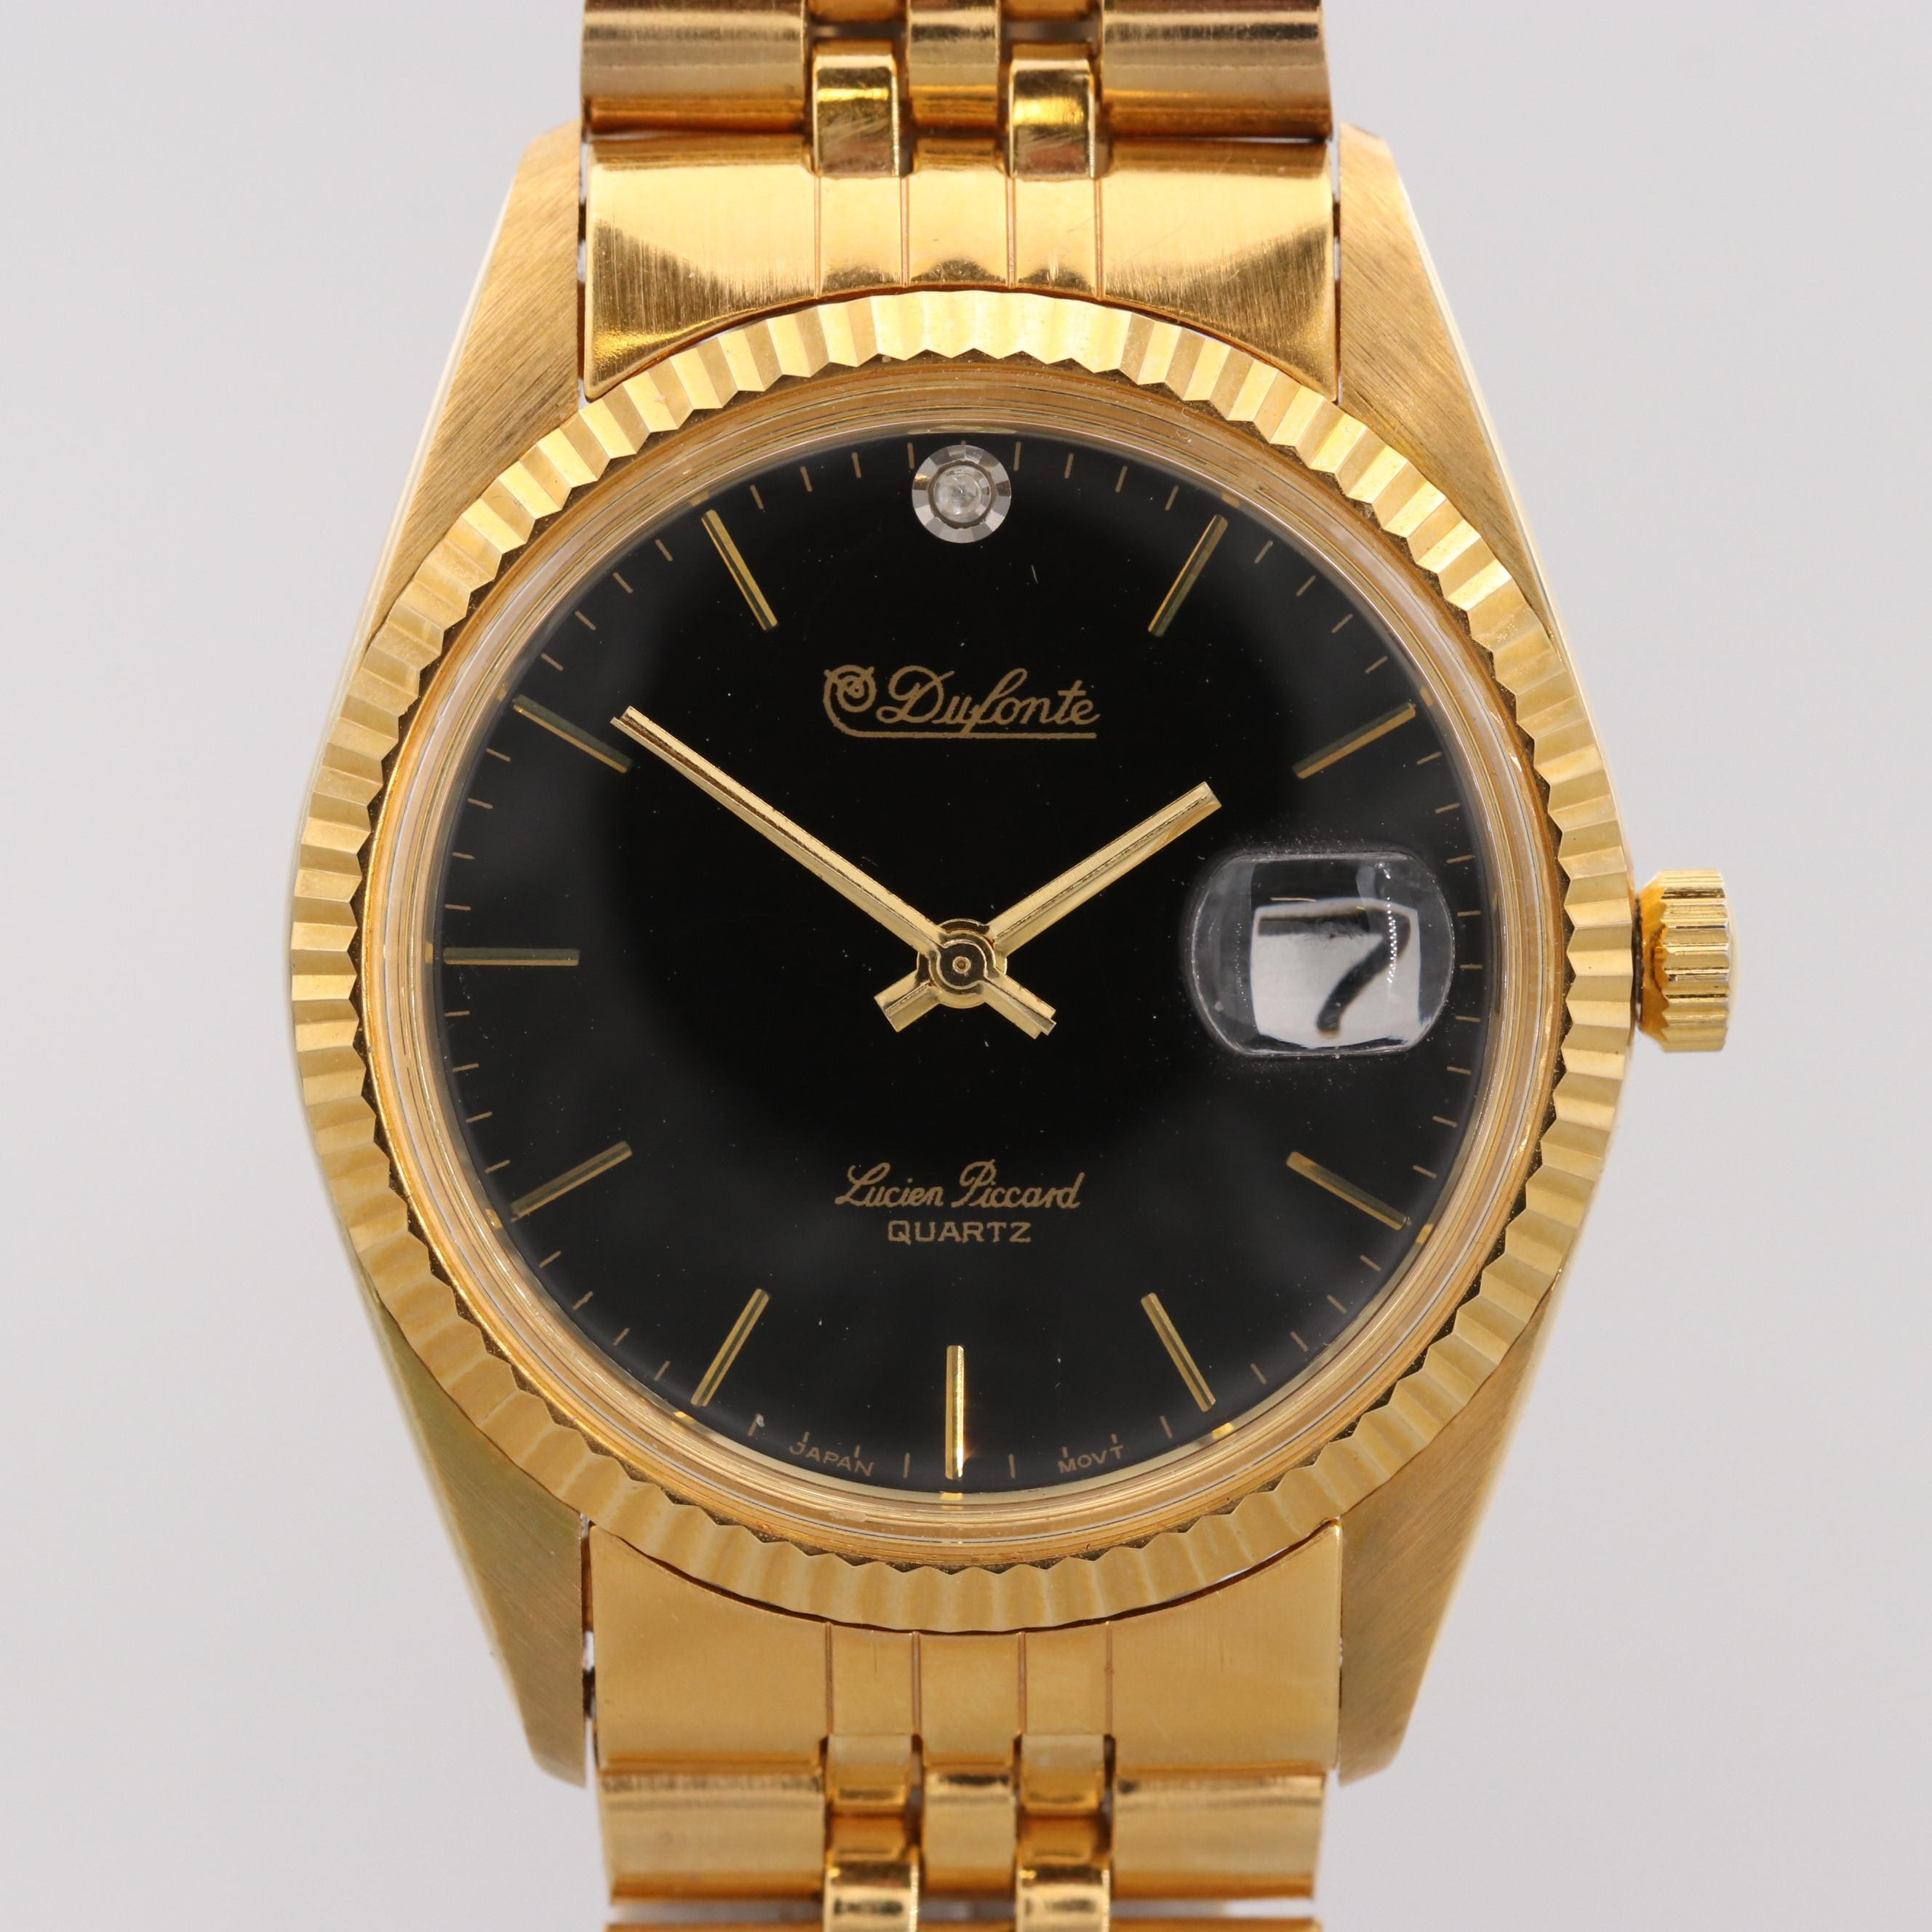 Dufonte by Lucien Piccard Gold Tone Quartz Wristwatch With Diamond Accent